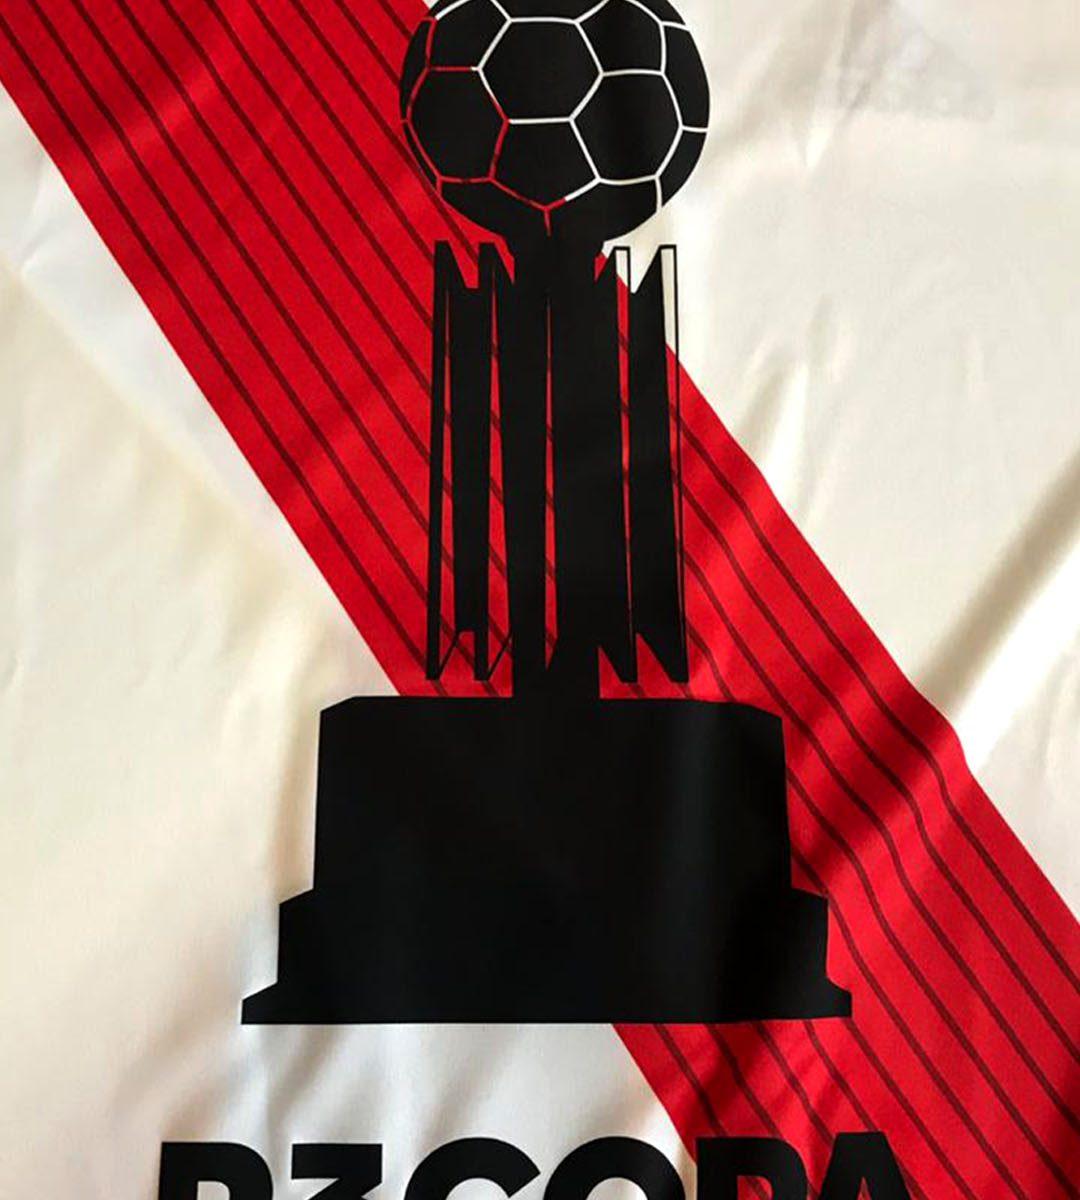 imagenes-de-river-plate-para-fondos-de-pantalla-para-celular-wallpaper-de-river-Camiseta River Plate campeón Recopa Sudamericana 2019 vs Athletico Paranaense